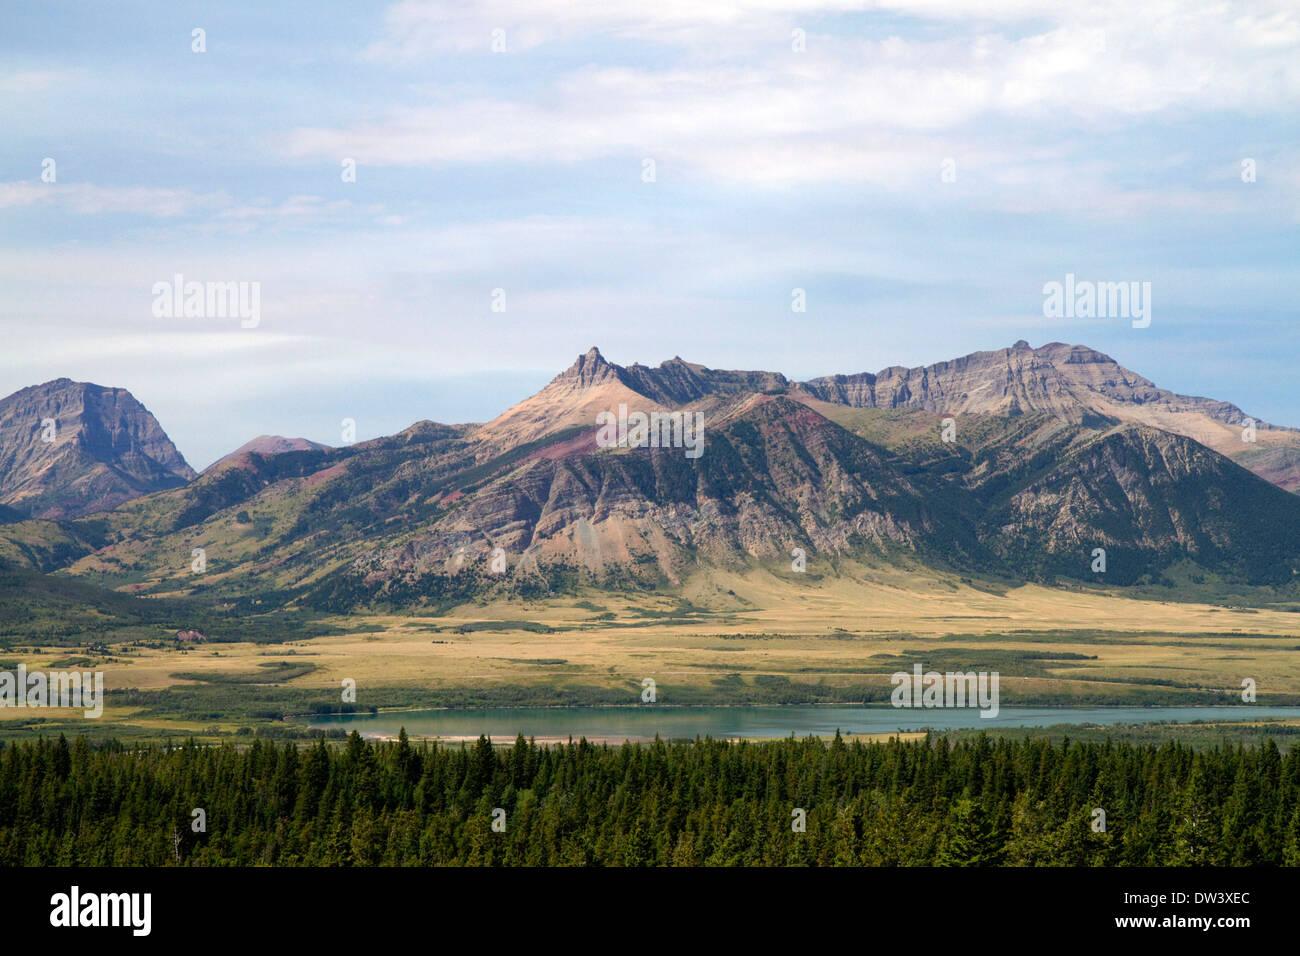 Malerischen Blick auf die kanadischen Rockies in Waterton Lakes Nationalpark, Alberta, Kanada. Stockbild